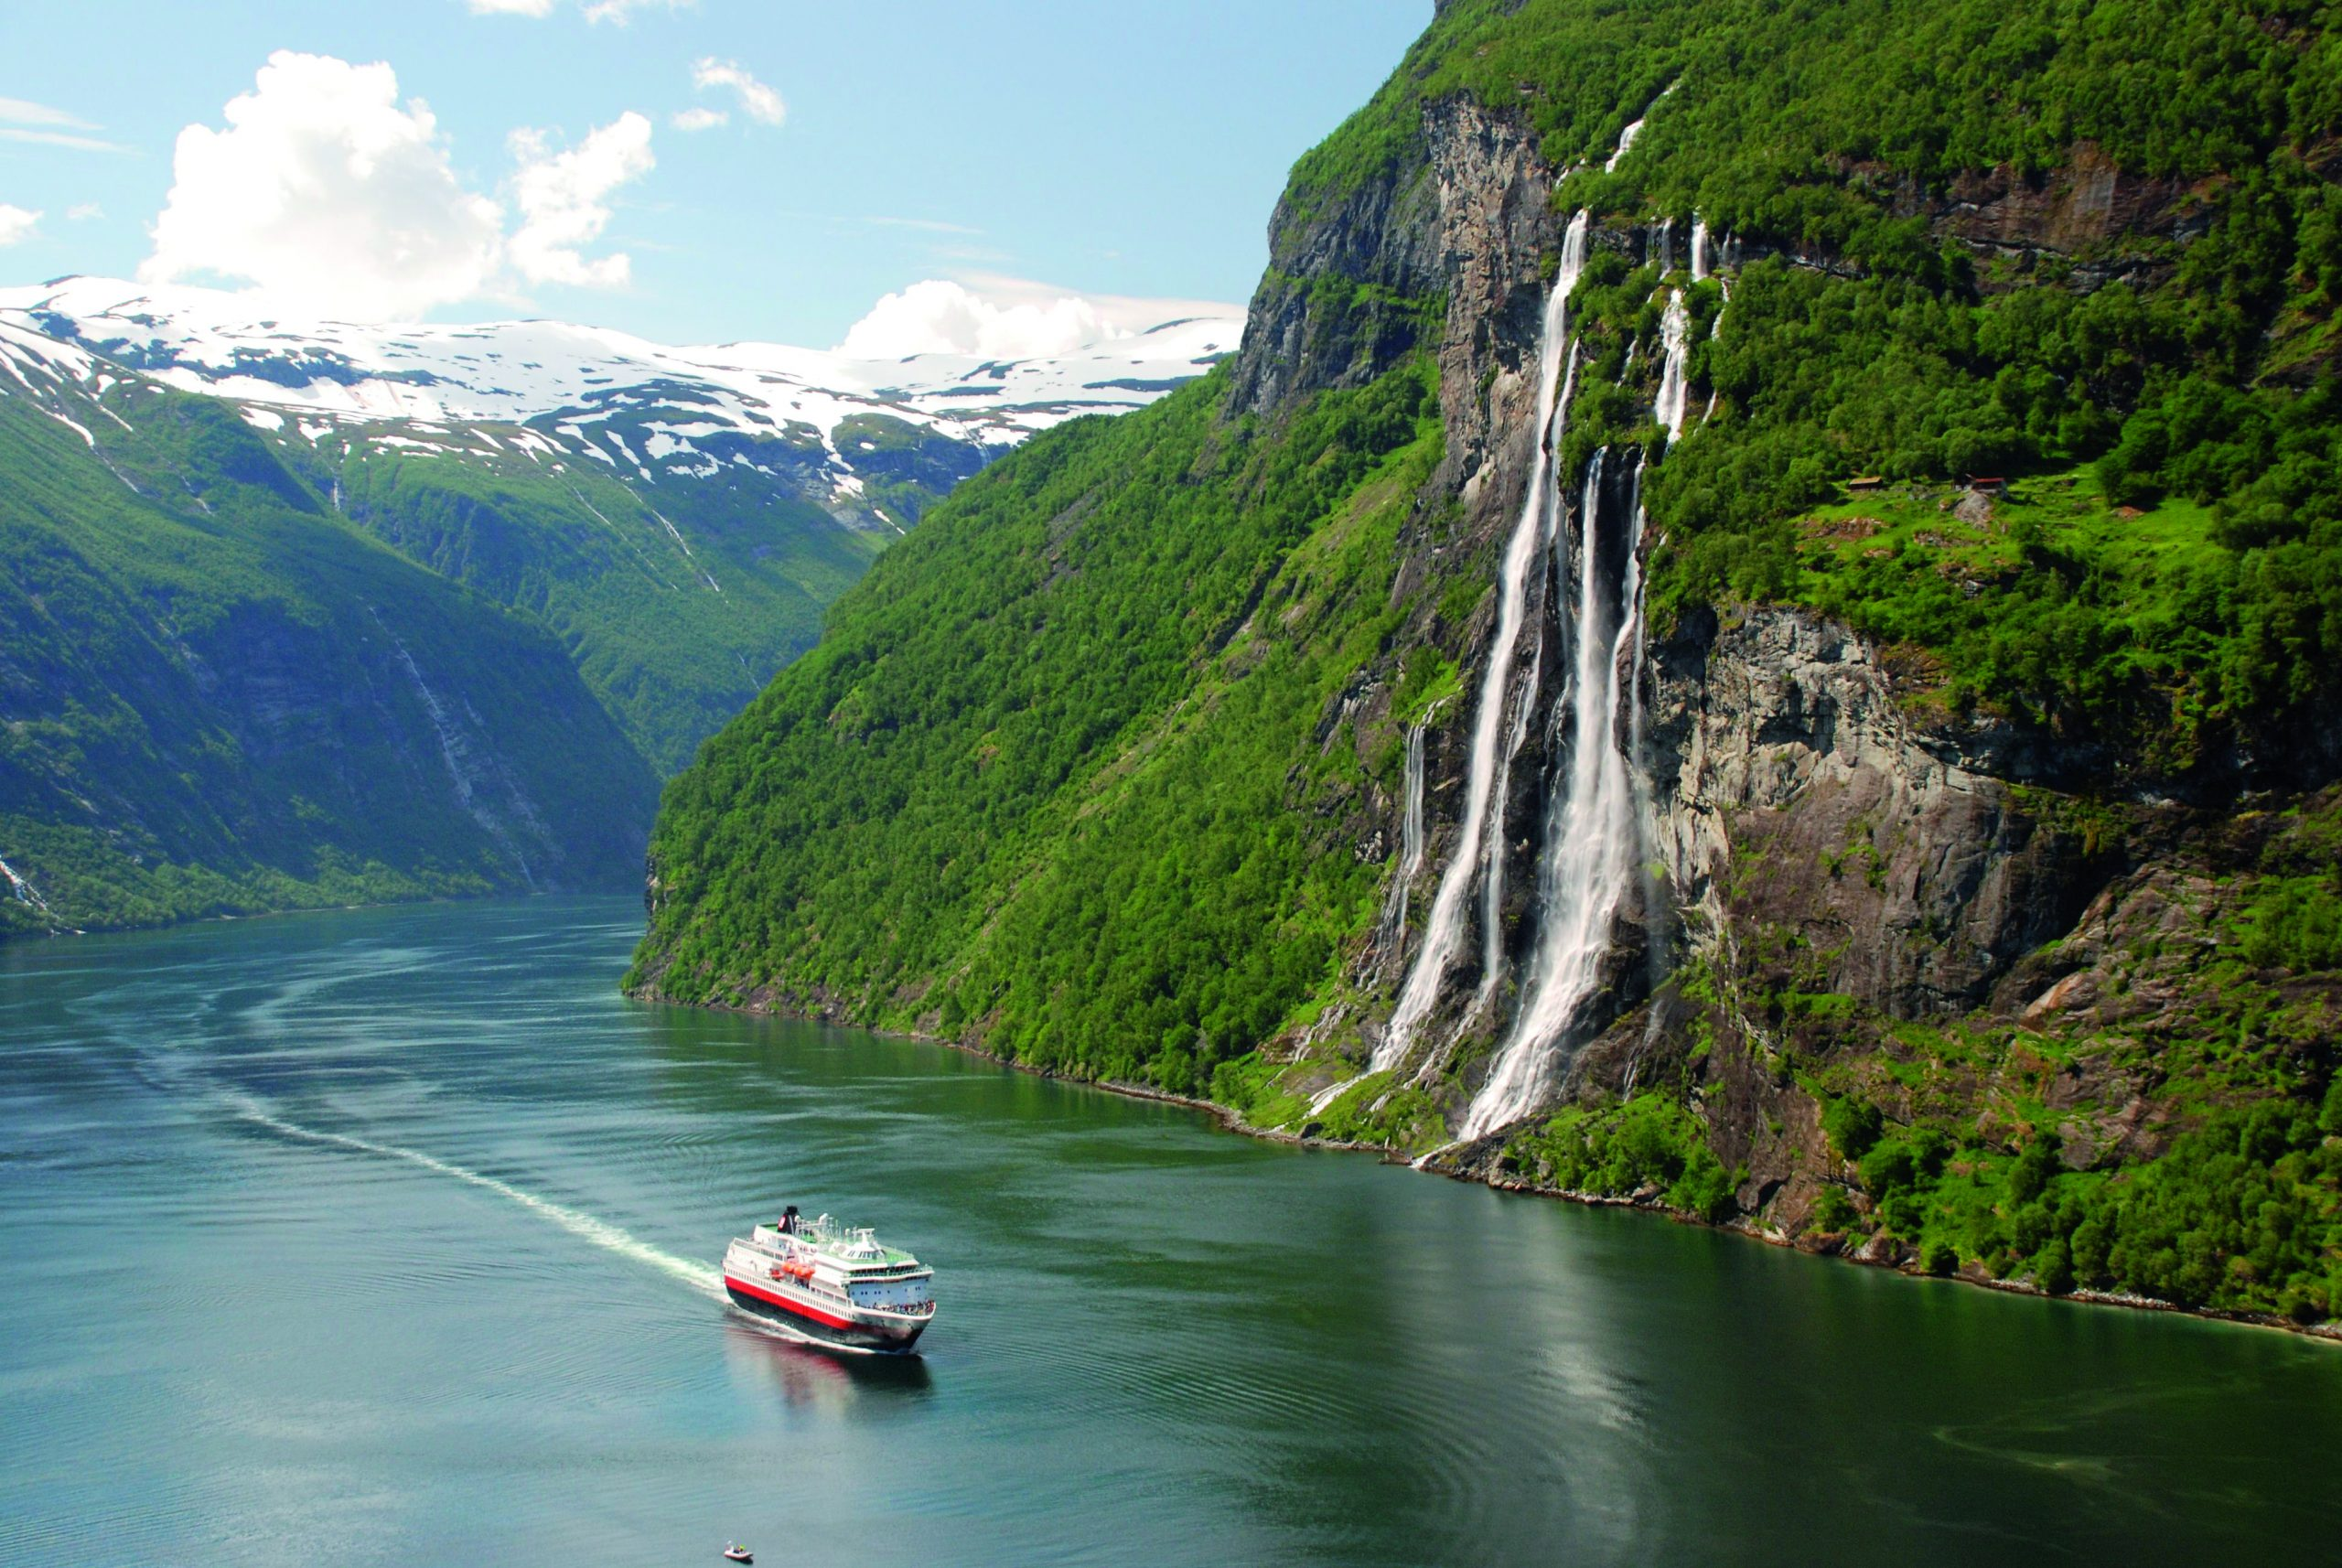 Geiranger Norge, vattenfall längs klippberg